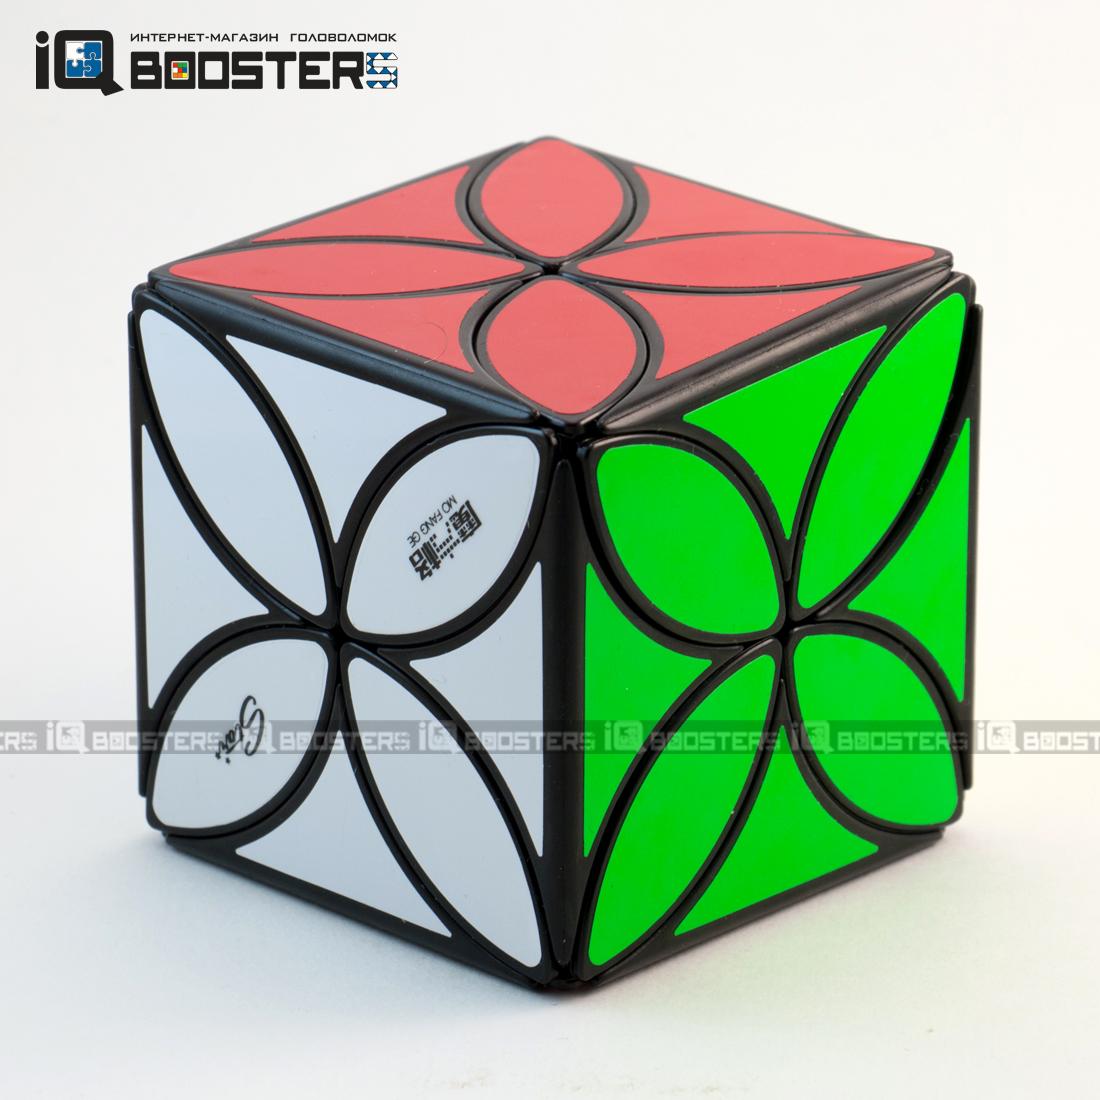 qiyi_clover_cube_b154